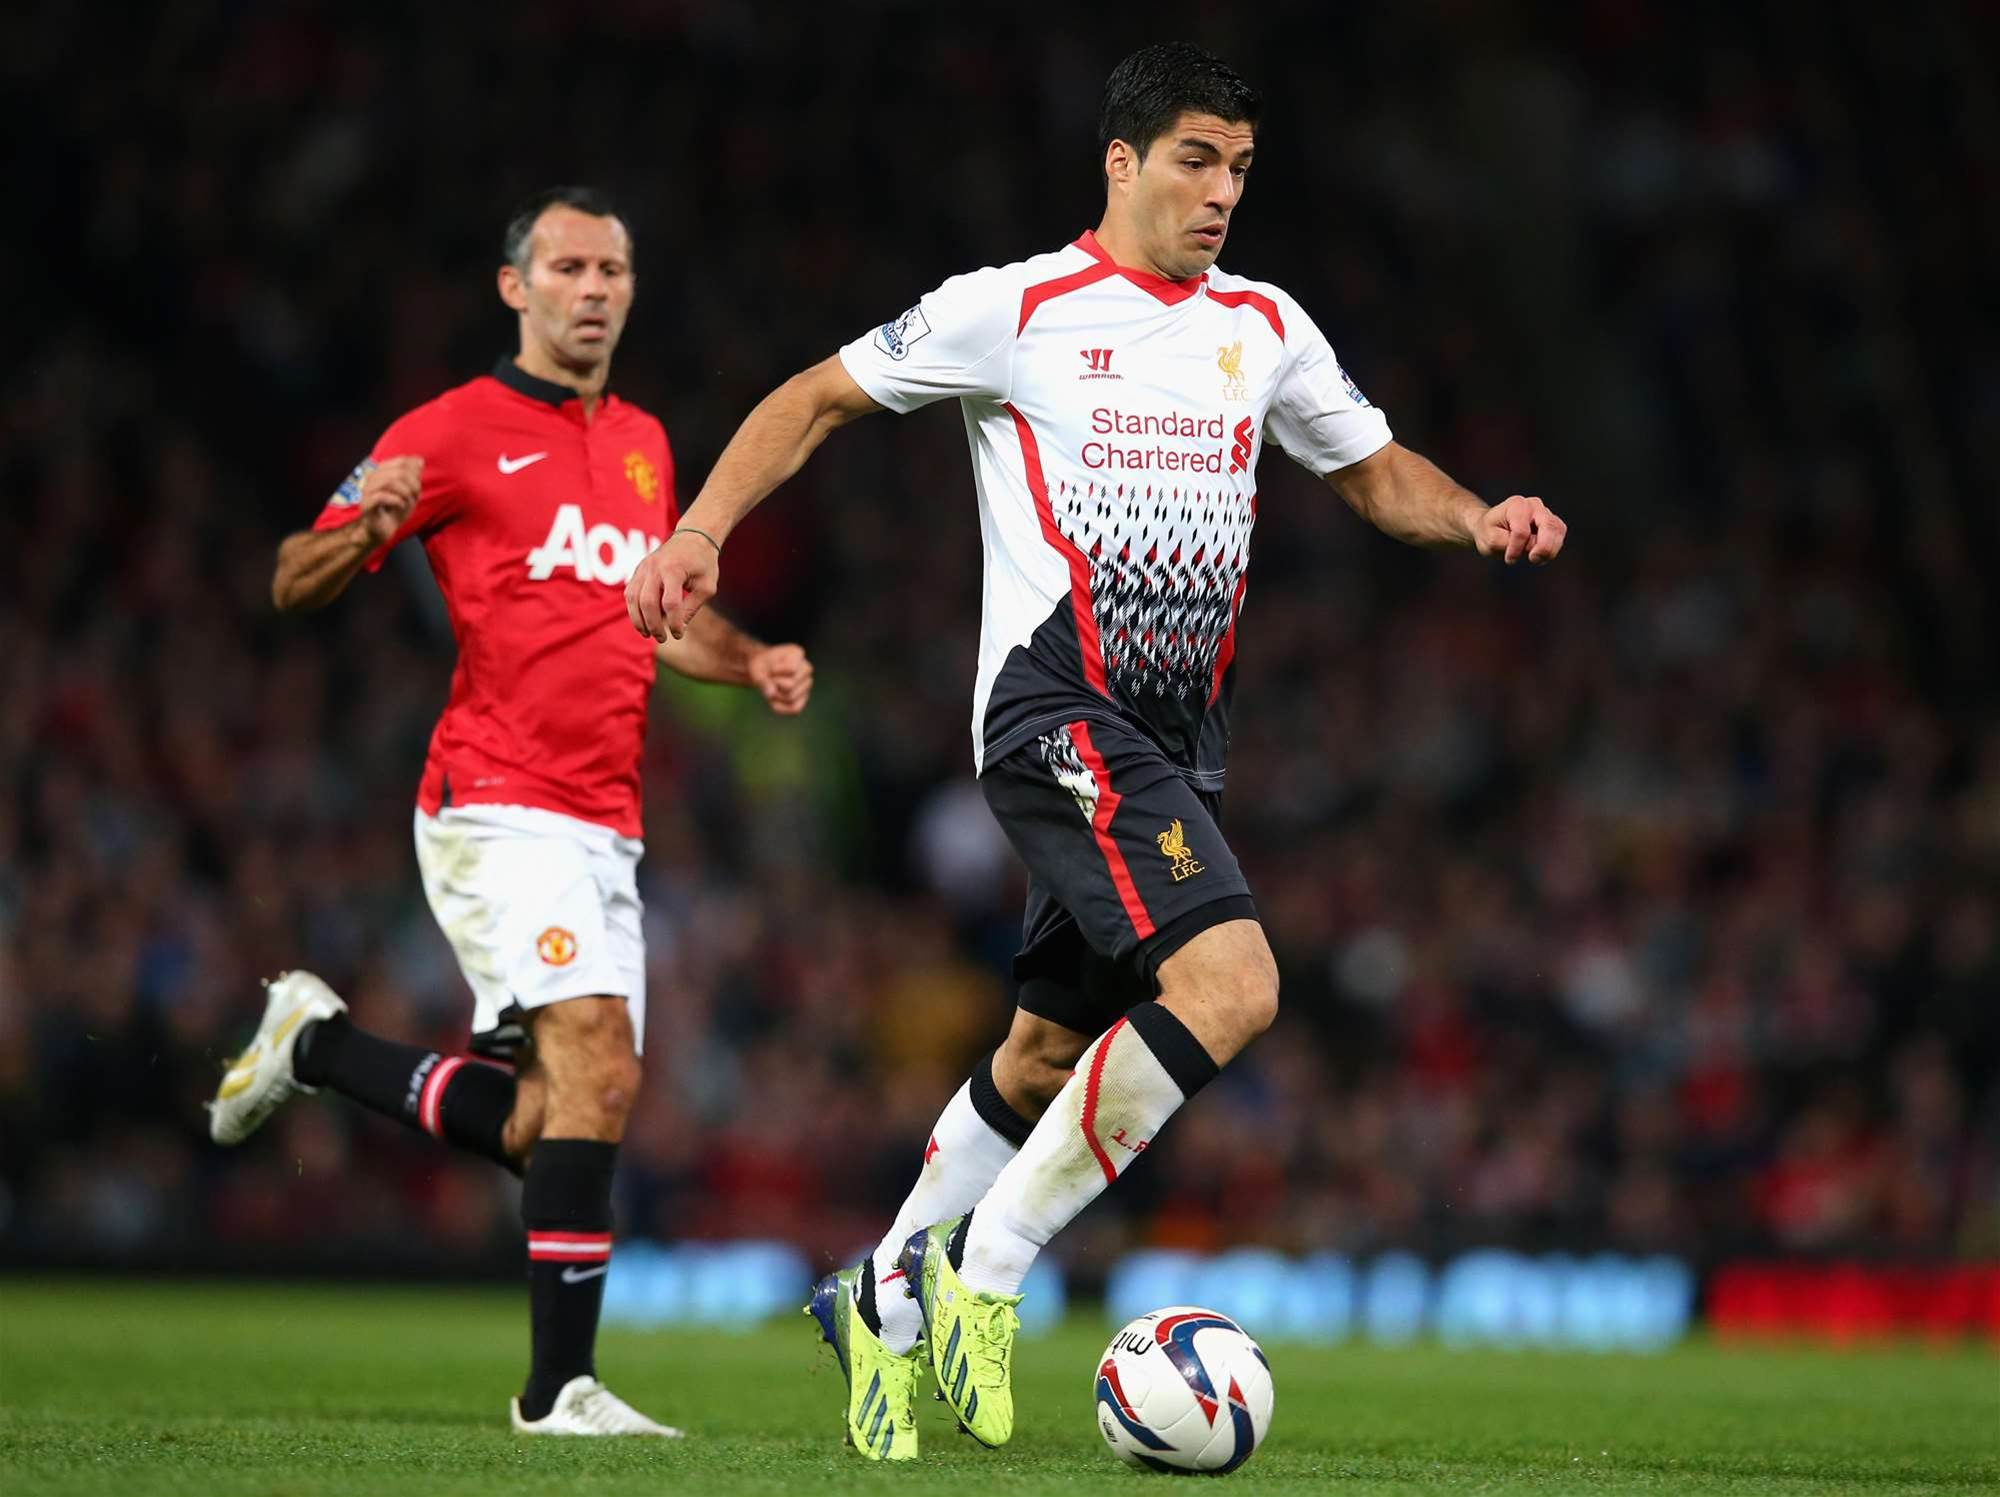 Manchester United wreck Suarez's return